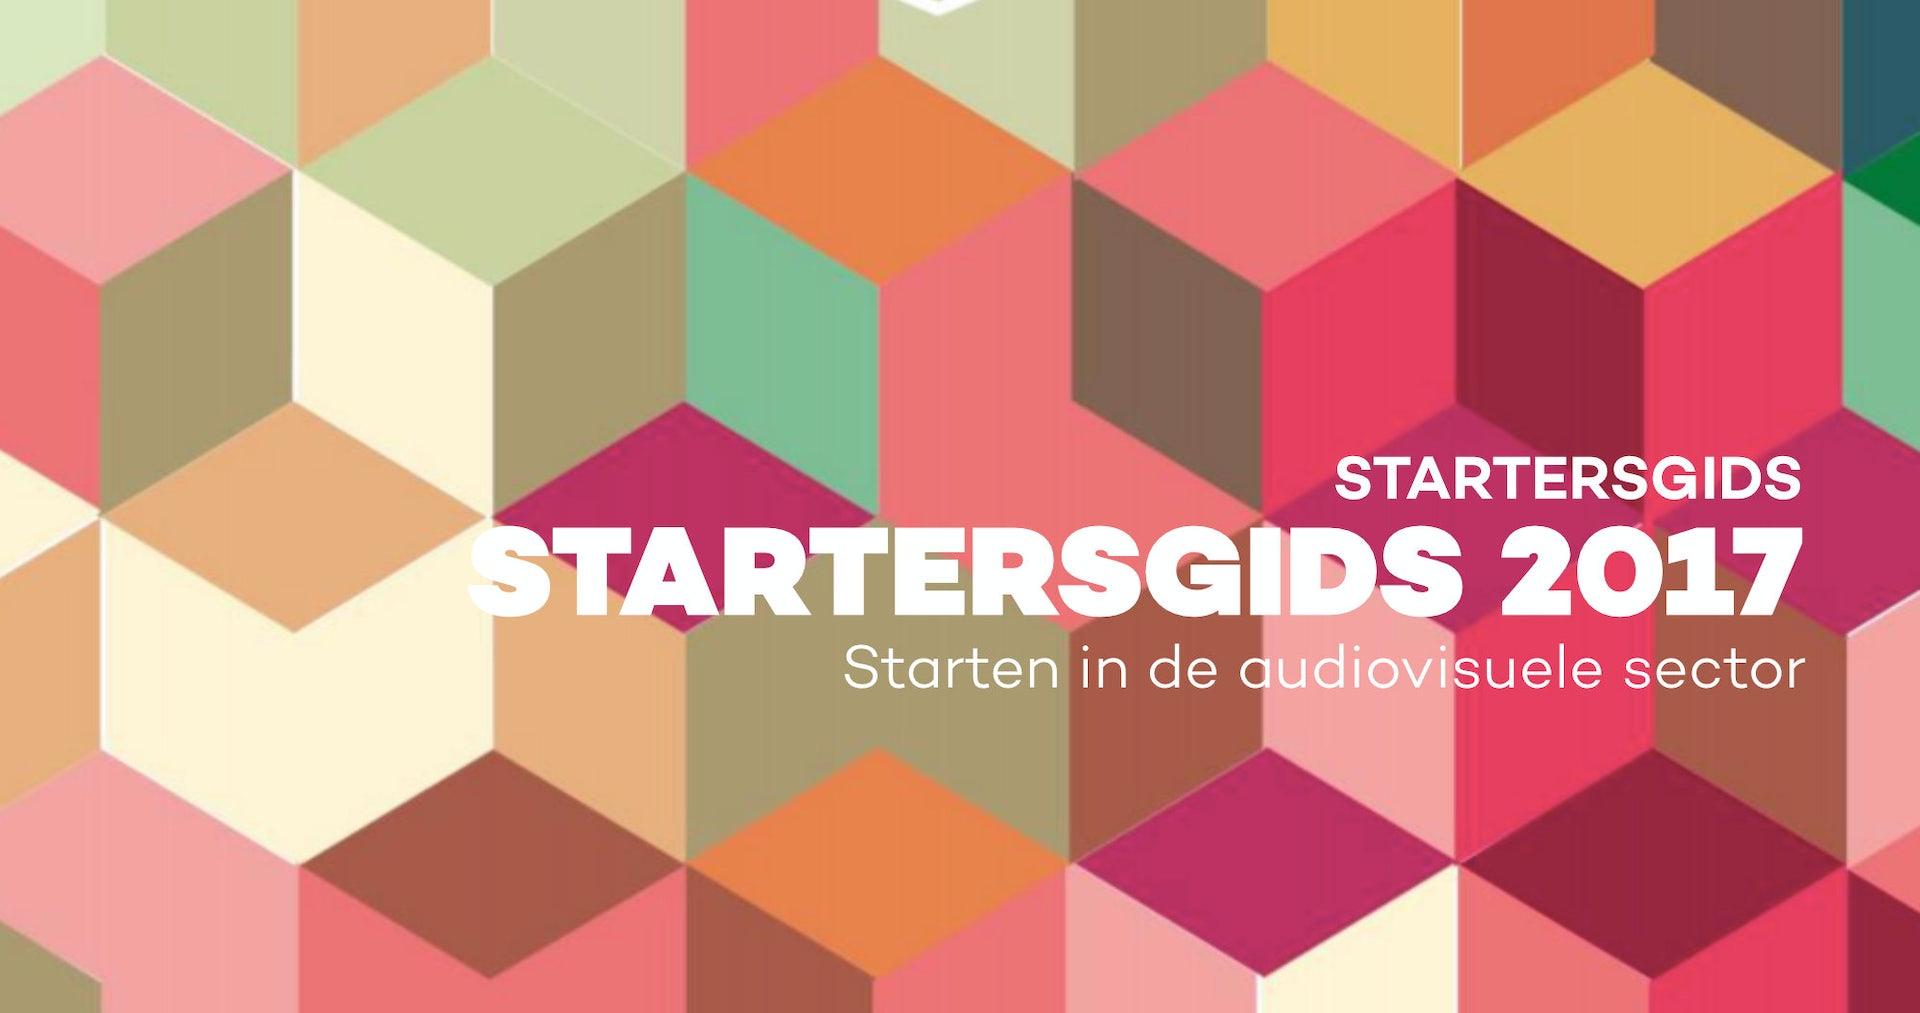 Startersgids 2017